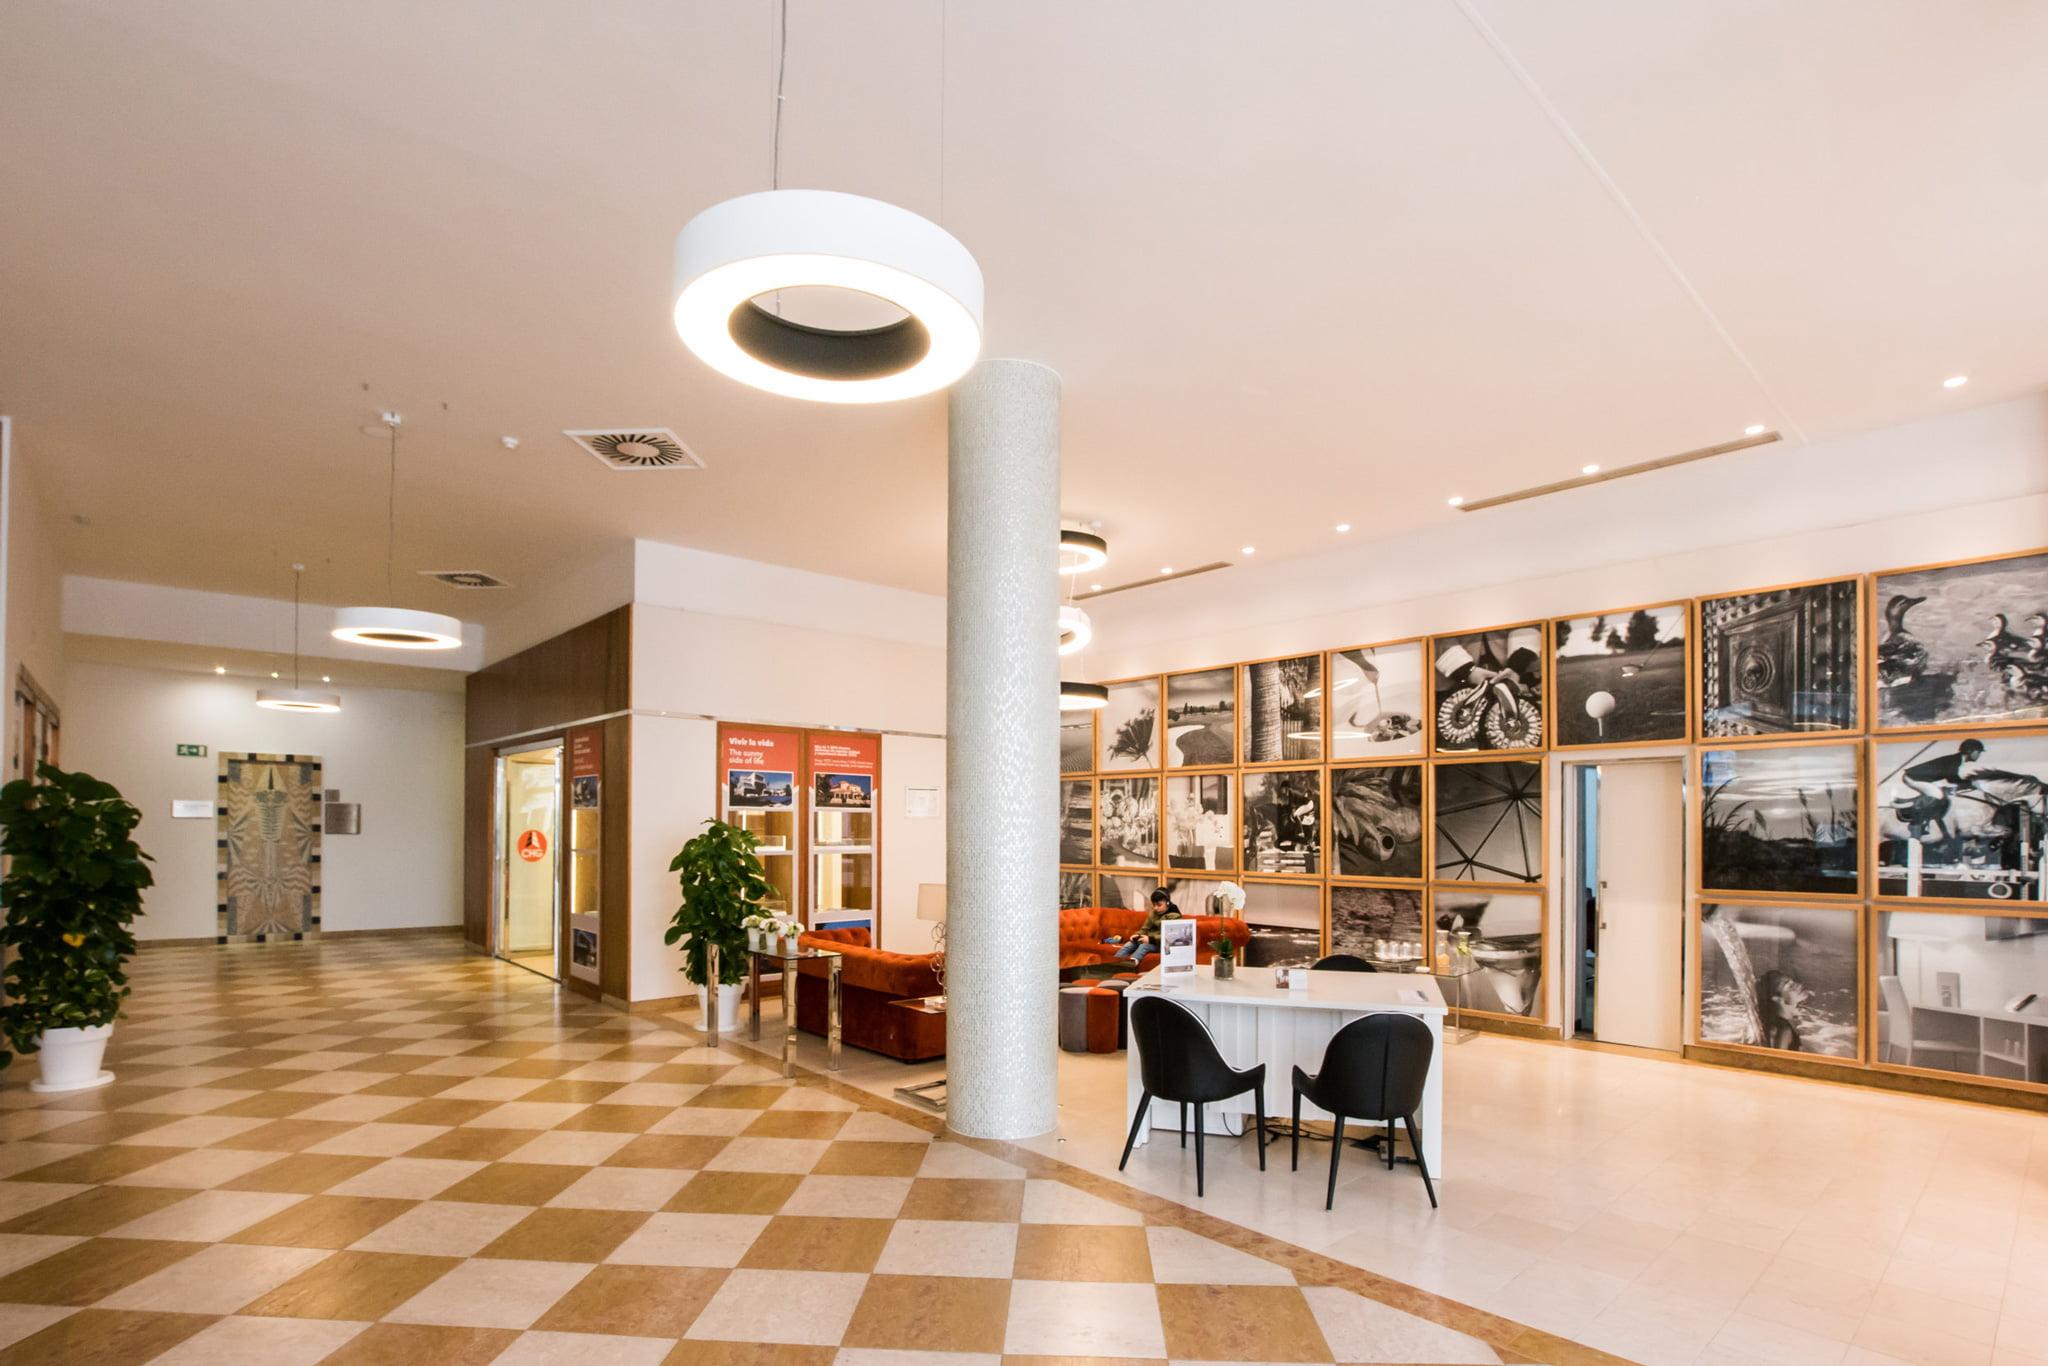 Interior Oliva Nova